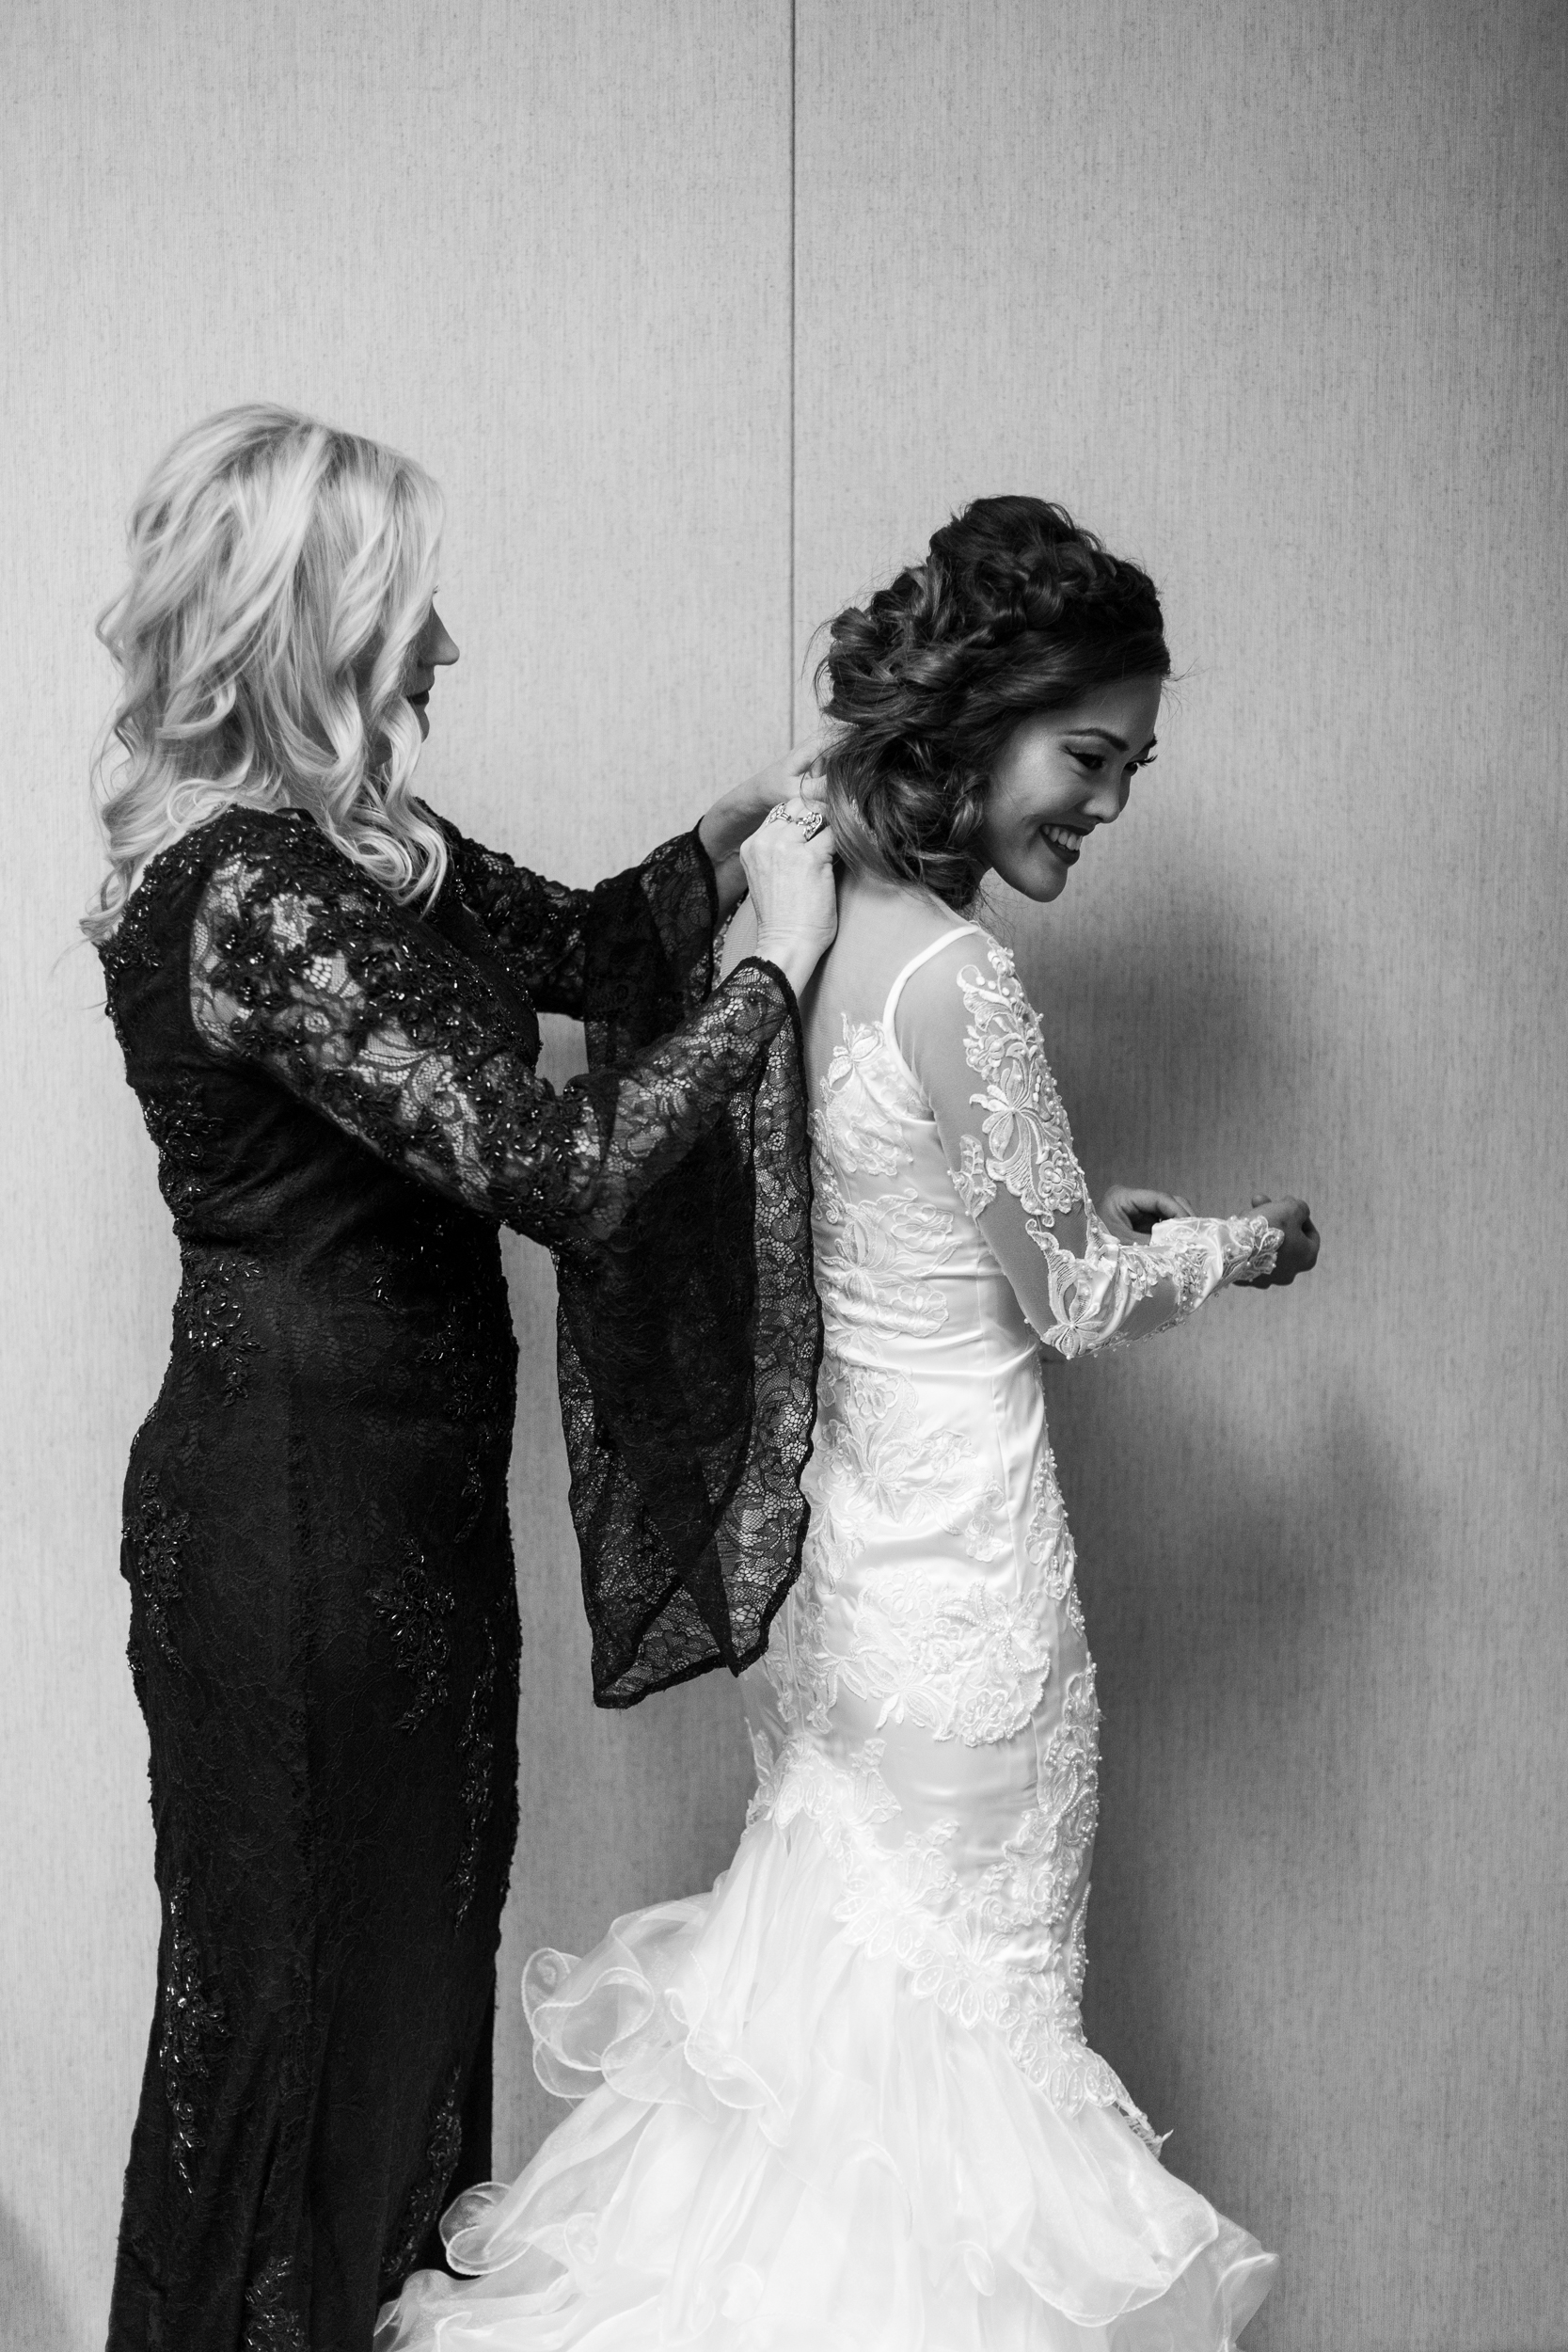 hall_wedding blog_kelsie hendricks photography_odessa_ west texas-28.jpg